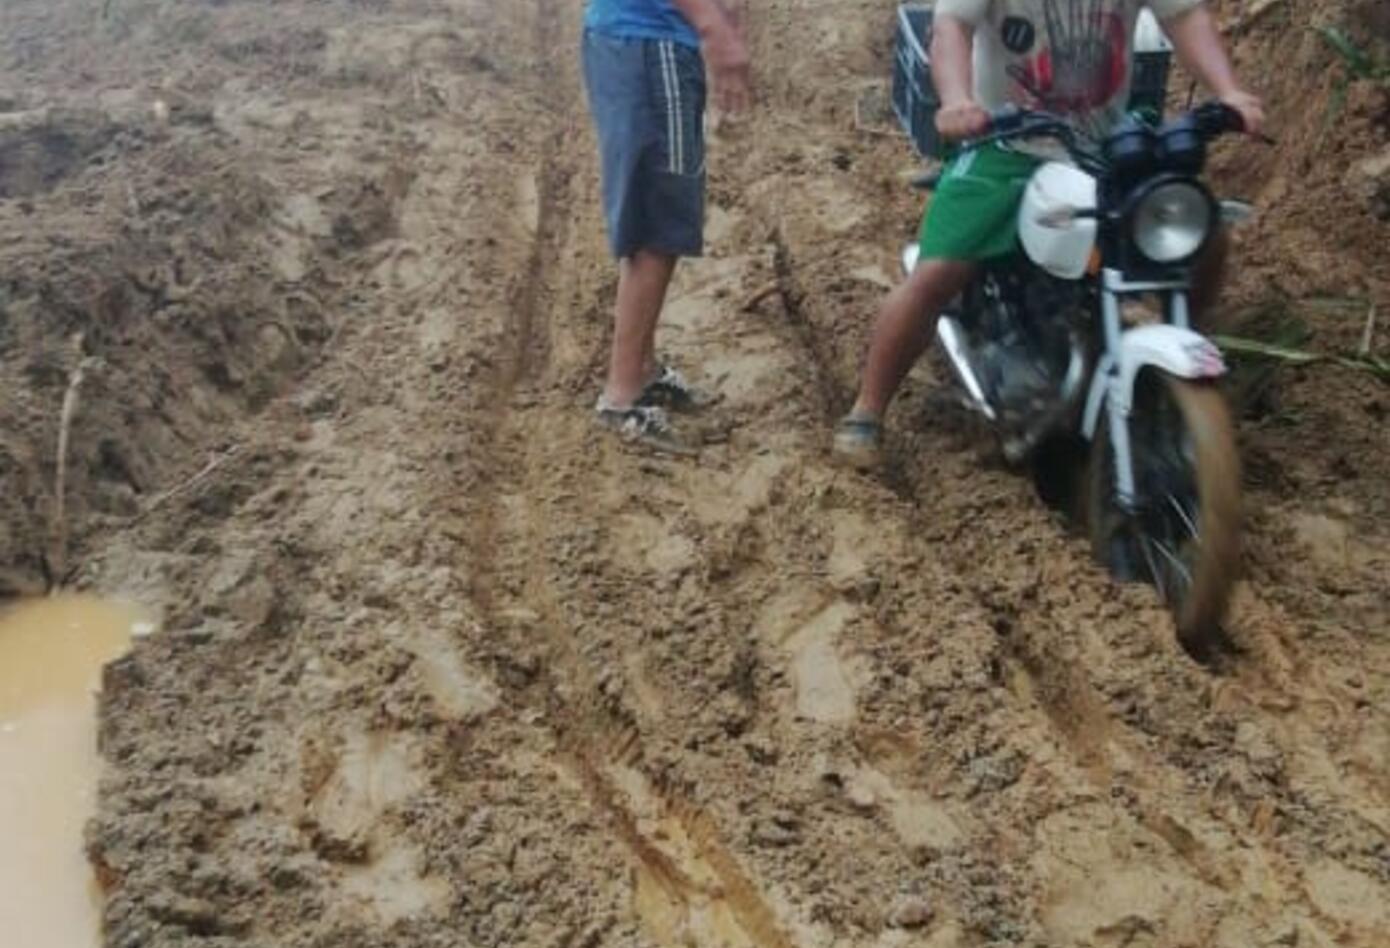 Dos derrumbes cayeron en San Luis, Antioquia, afectando la autopista Medellín-Bogotá